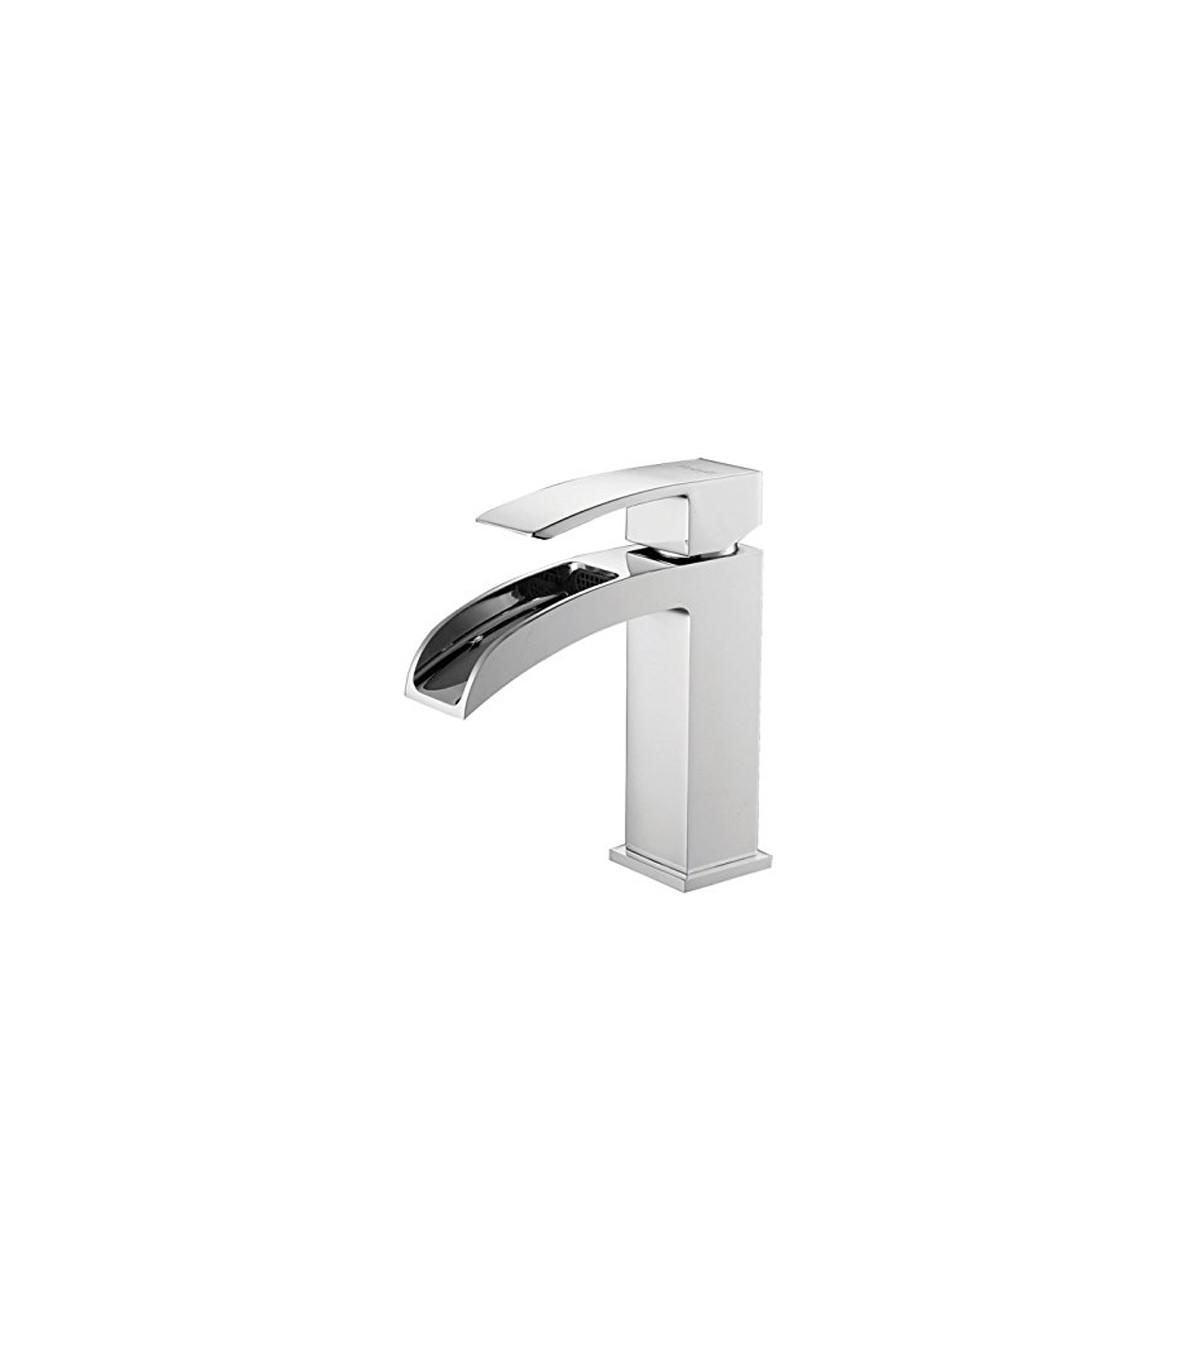 LS-BF3 Bathroom Faucet Brushed Nickel